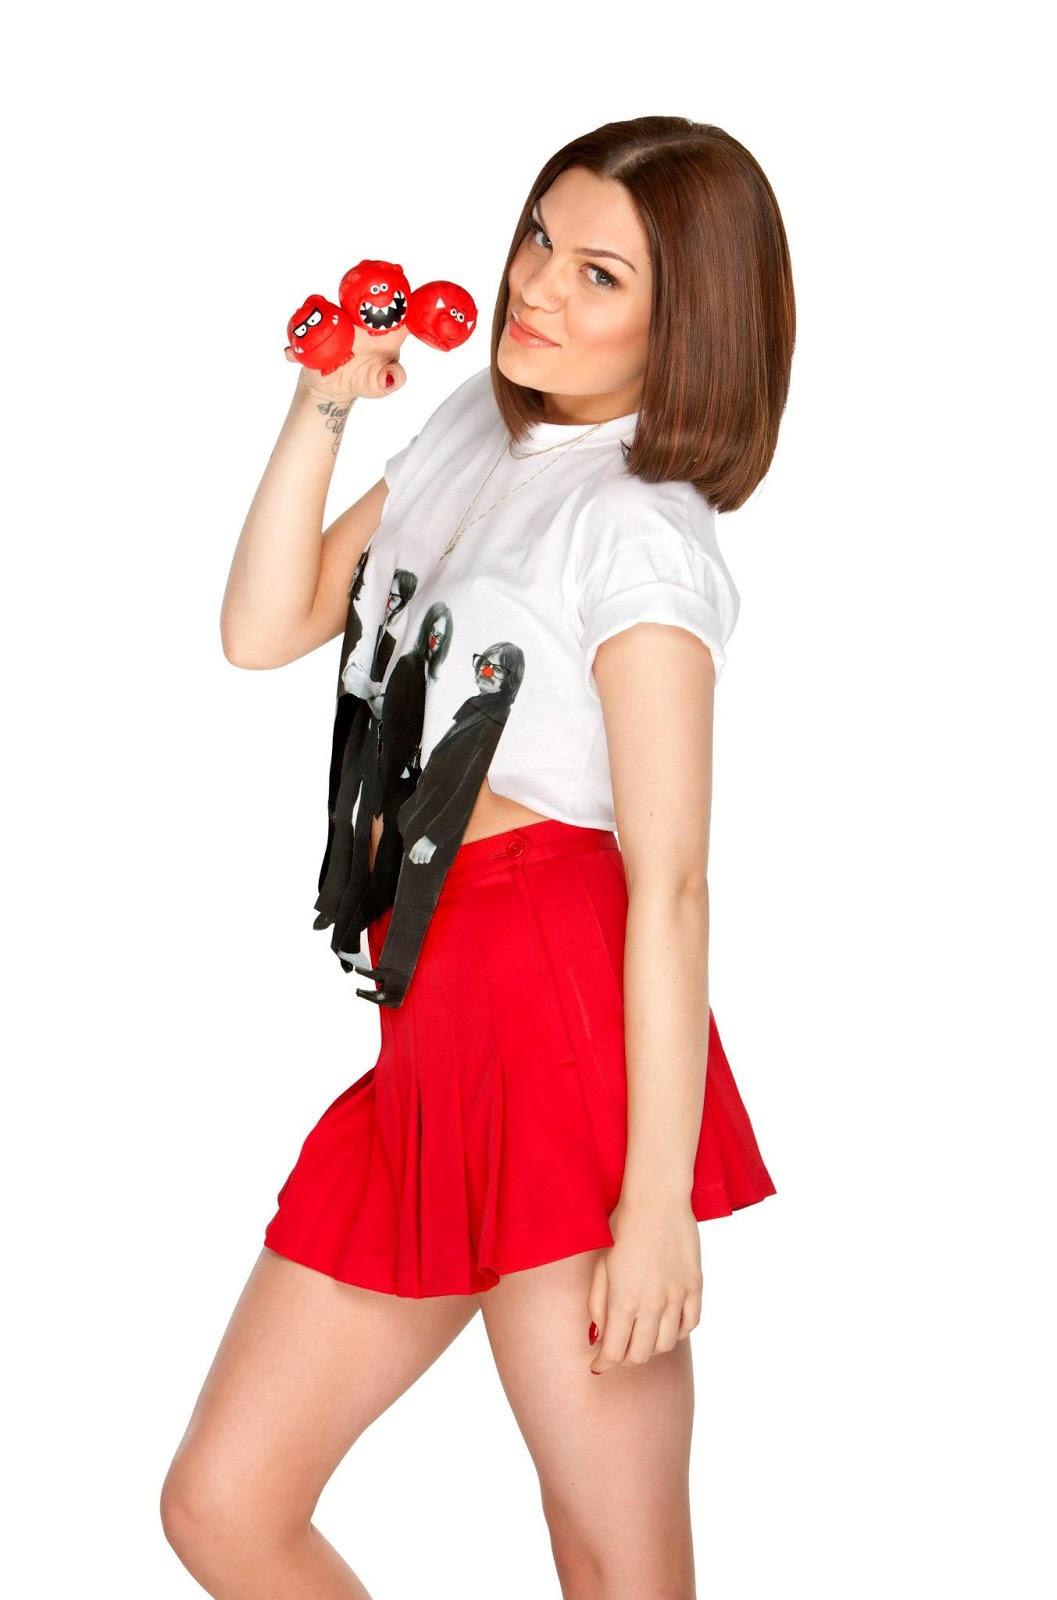 http://2.bp.blogspot.com/-pjRT2s0D4R8/US-EH8uQPpI/AAAAAAABJvI/KK8xVFcSFZ8/s1600/1r+jessie.jpg